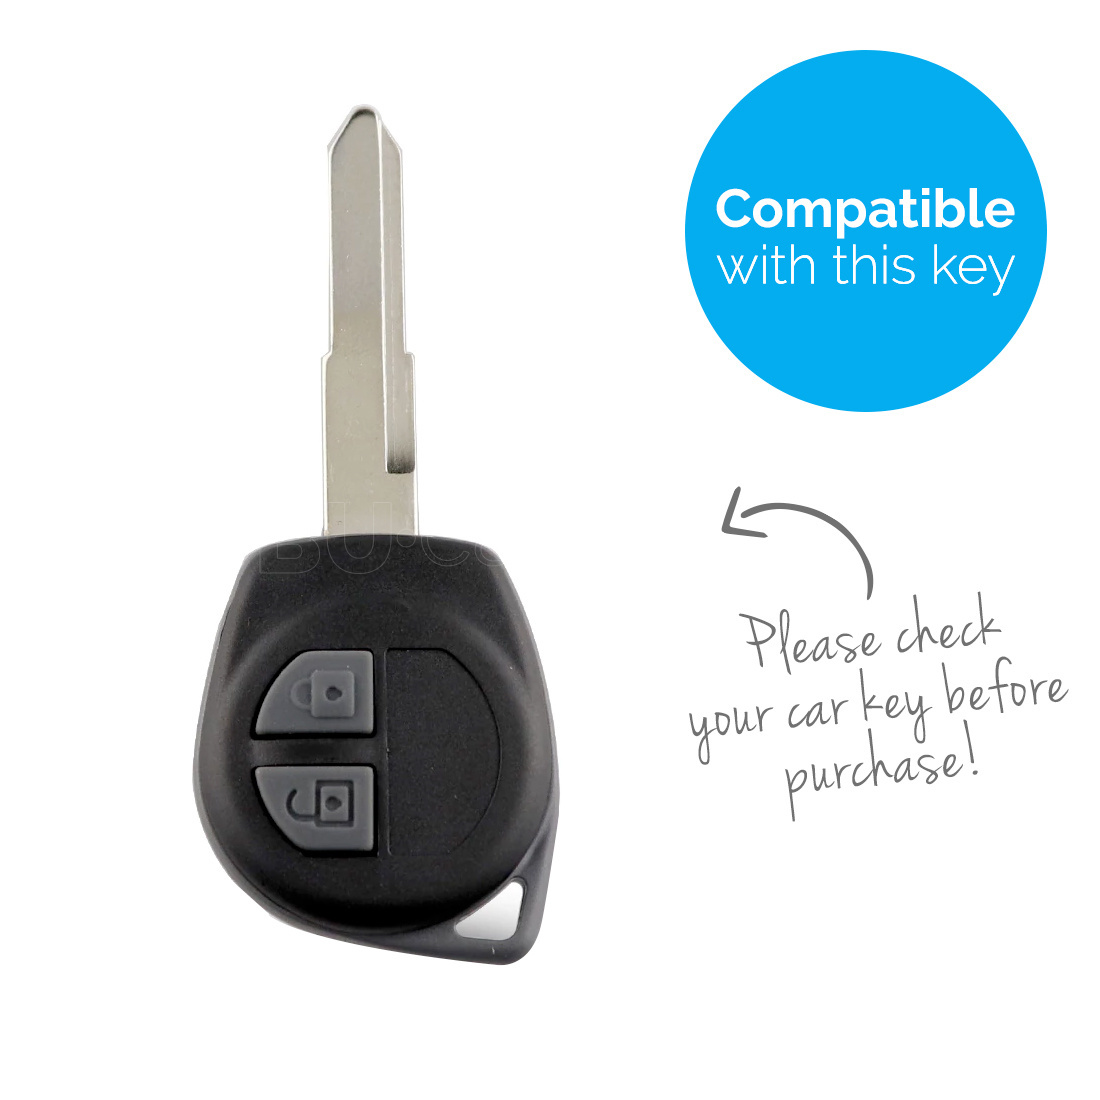 TBU car TBU car Sleutel cover compatibel met Suzuki - Silicone sleutelhoesje - beschermhoesje autosleutel - Zwart